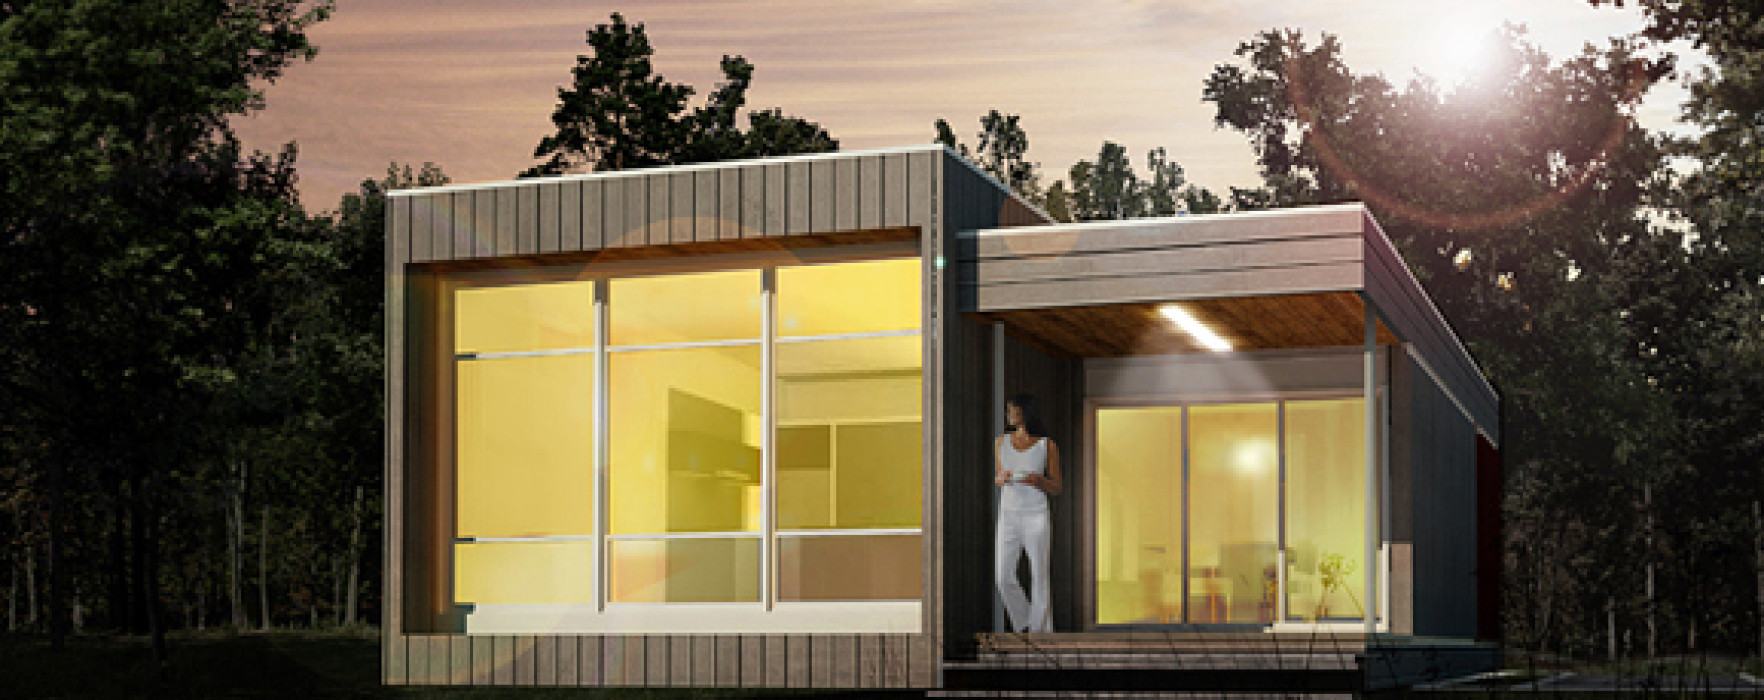 Case in legno prefabbricate a prezzi bassi for Listino prezzi case prefabbricate